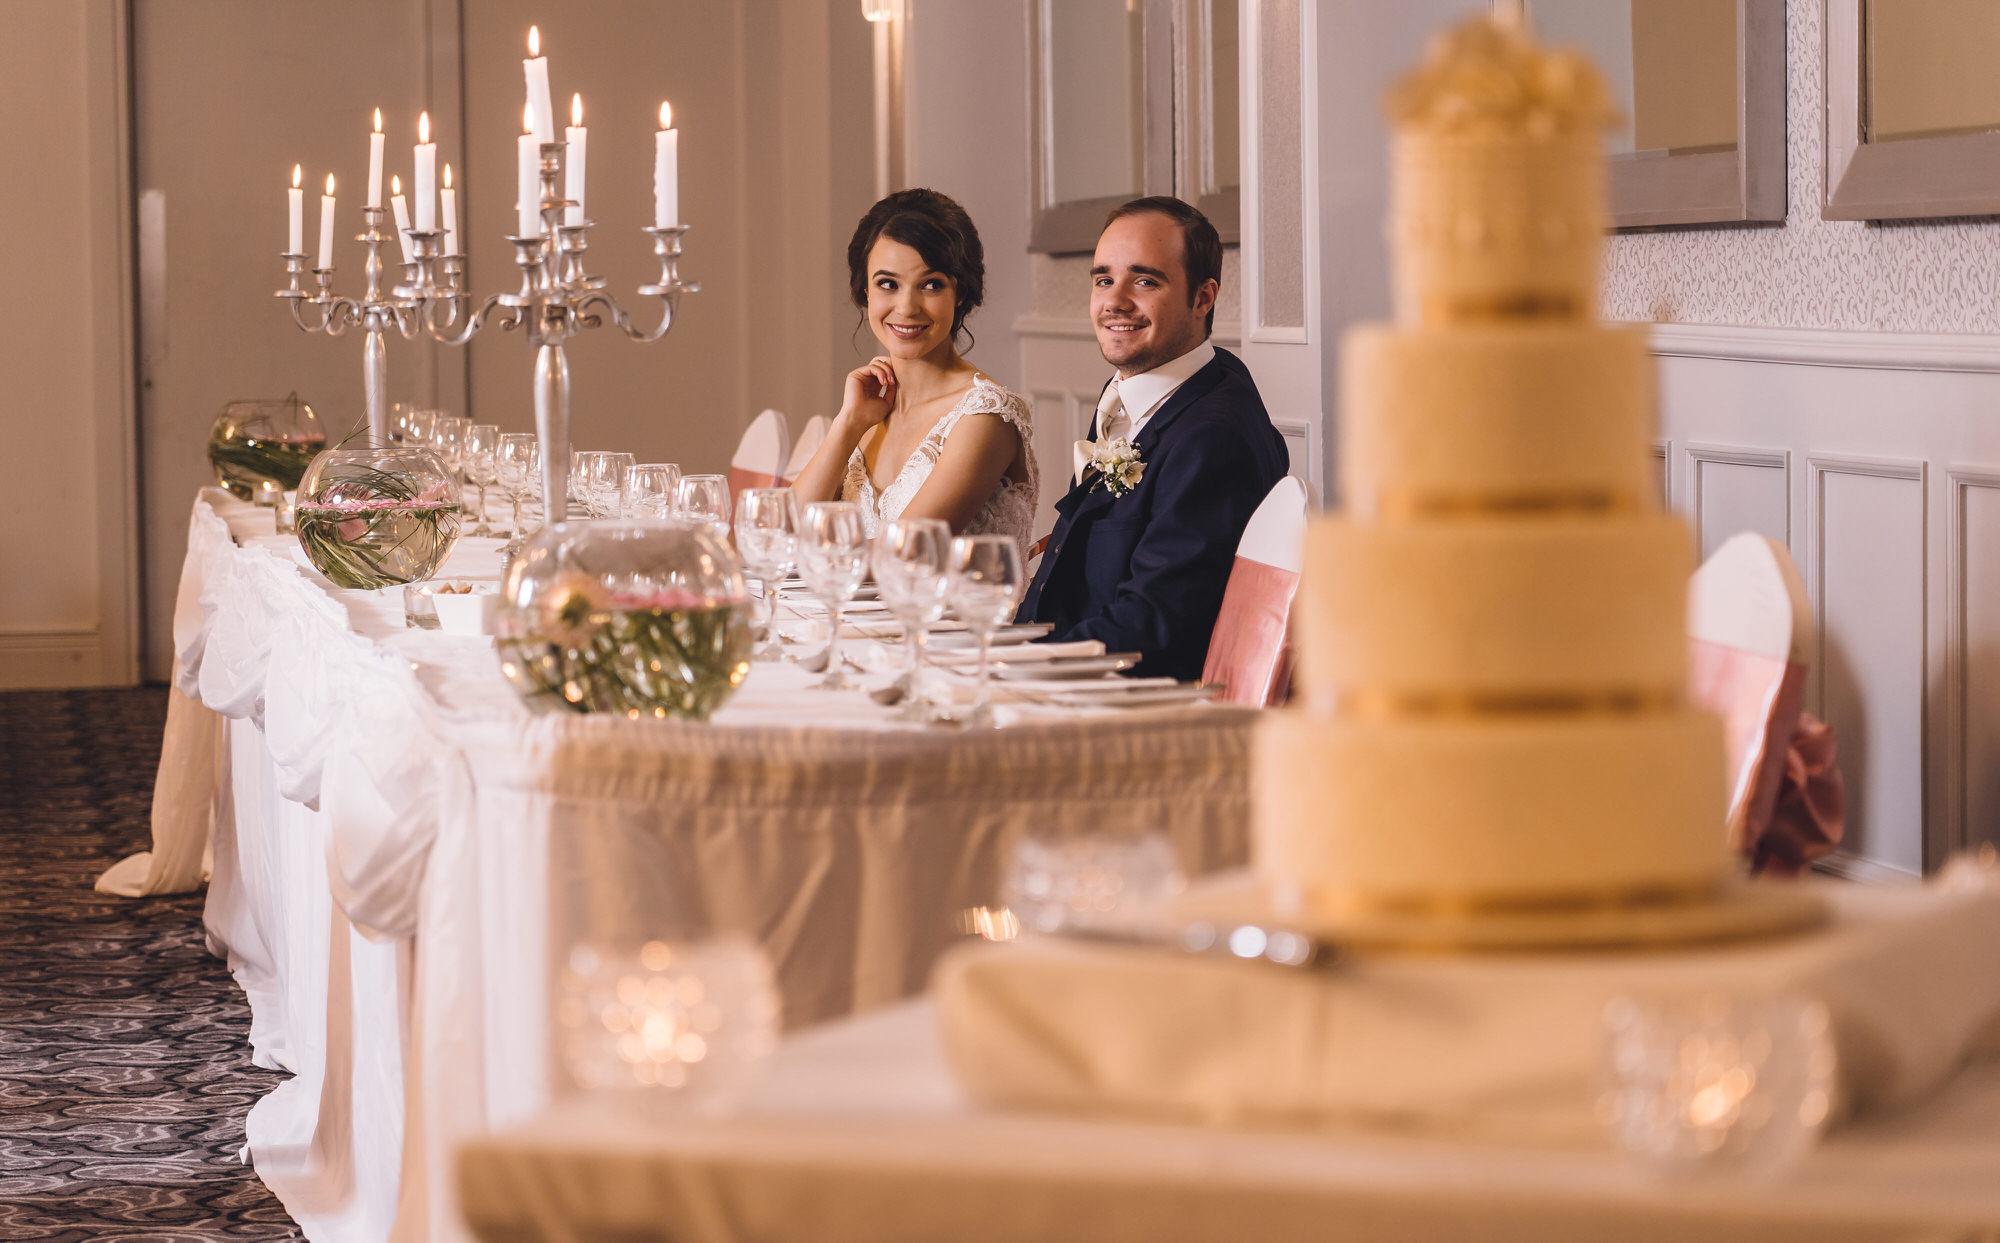 Roger-kenny-wedding-photographer-wicklow_121.jpg